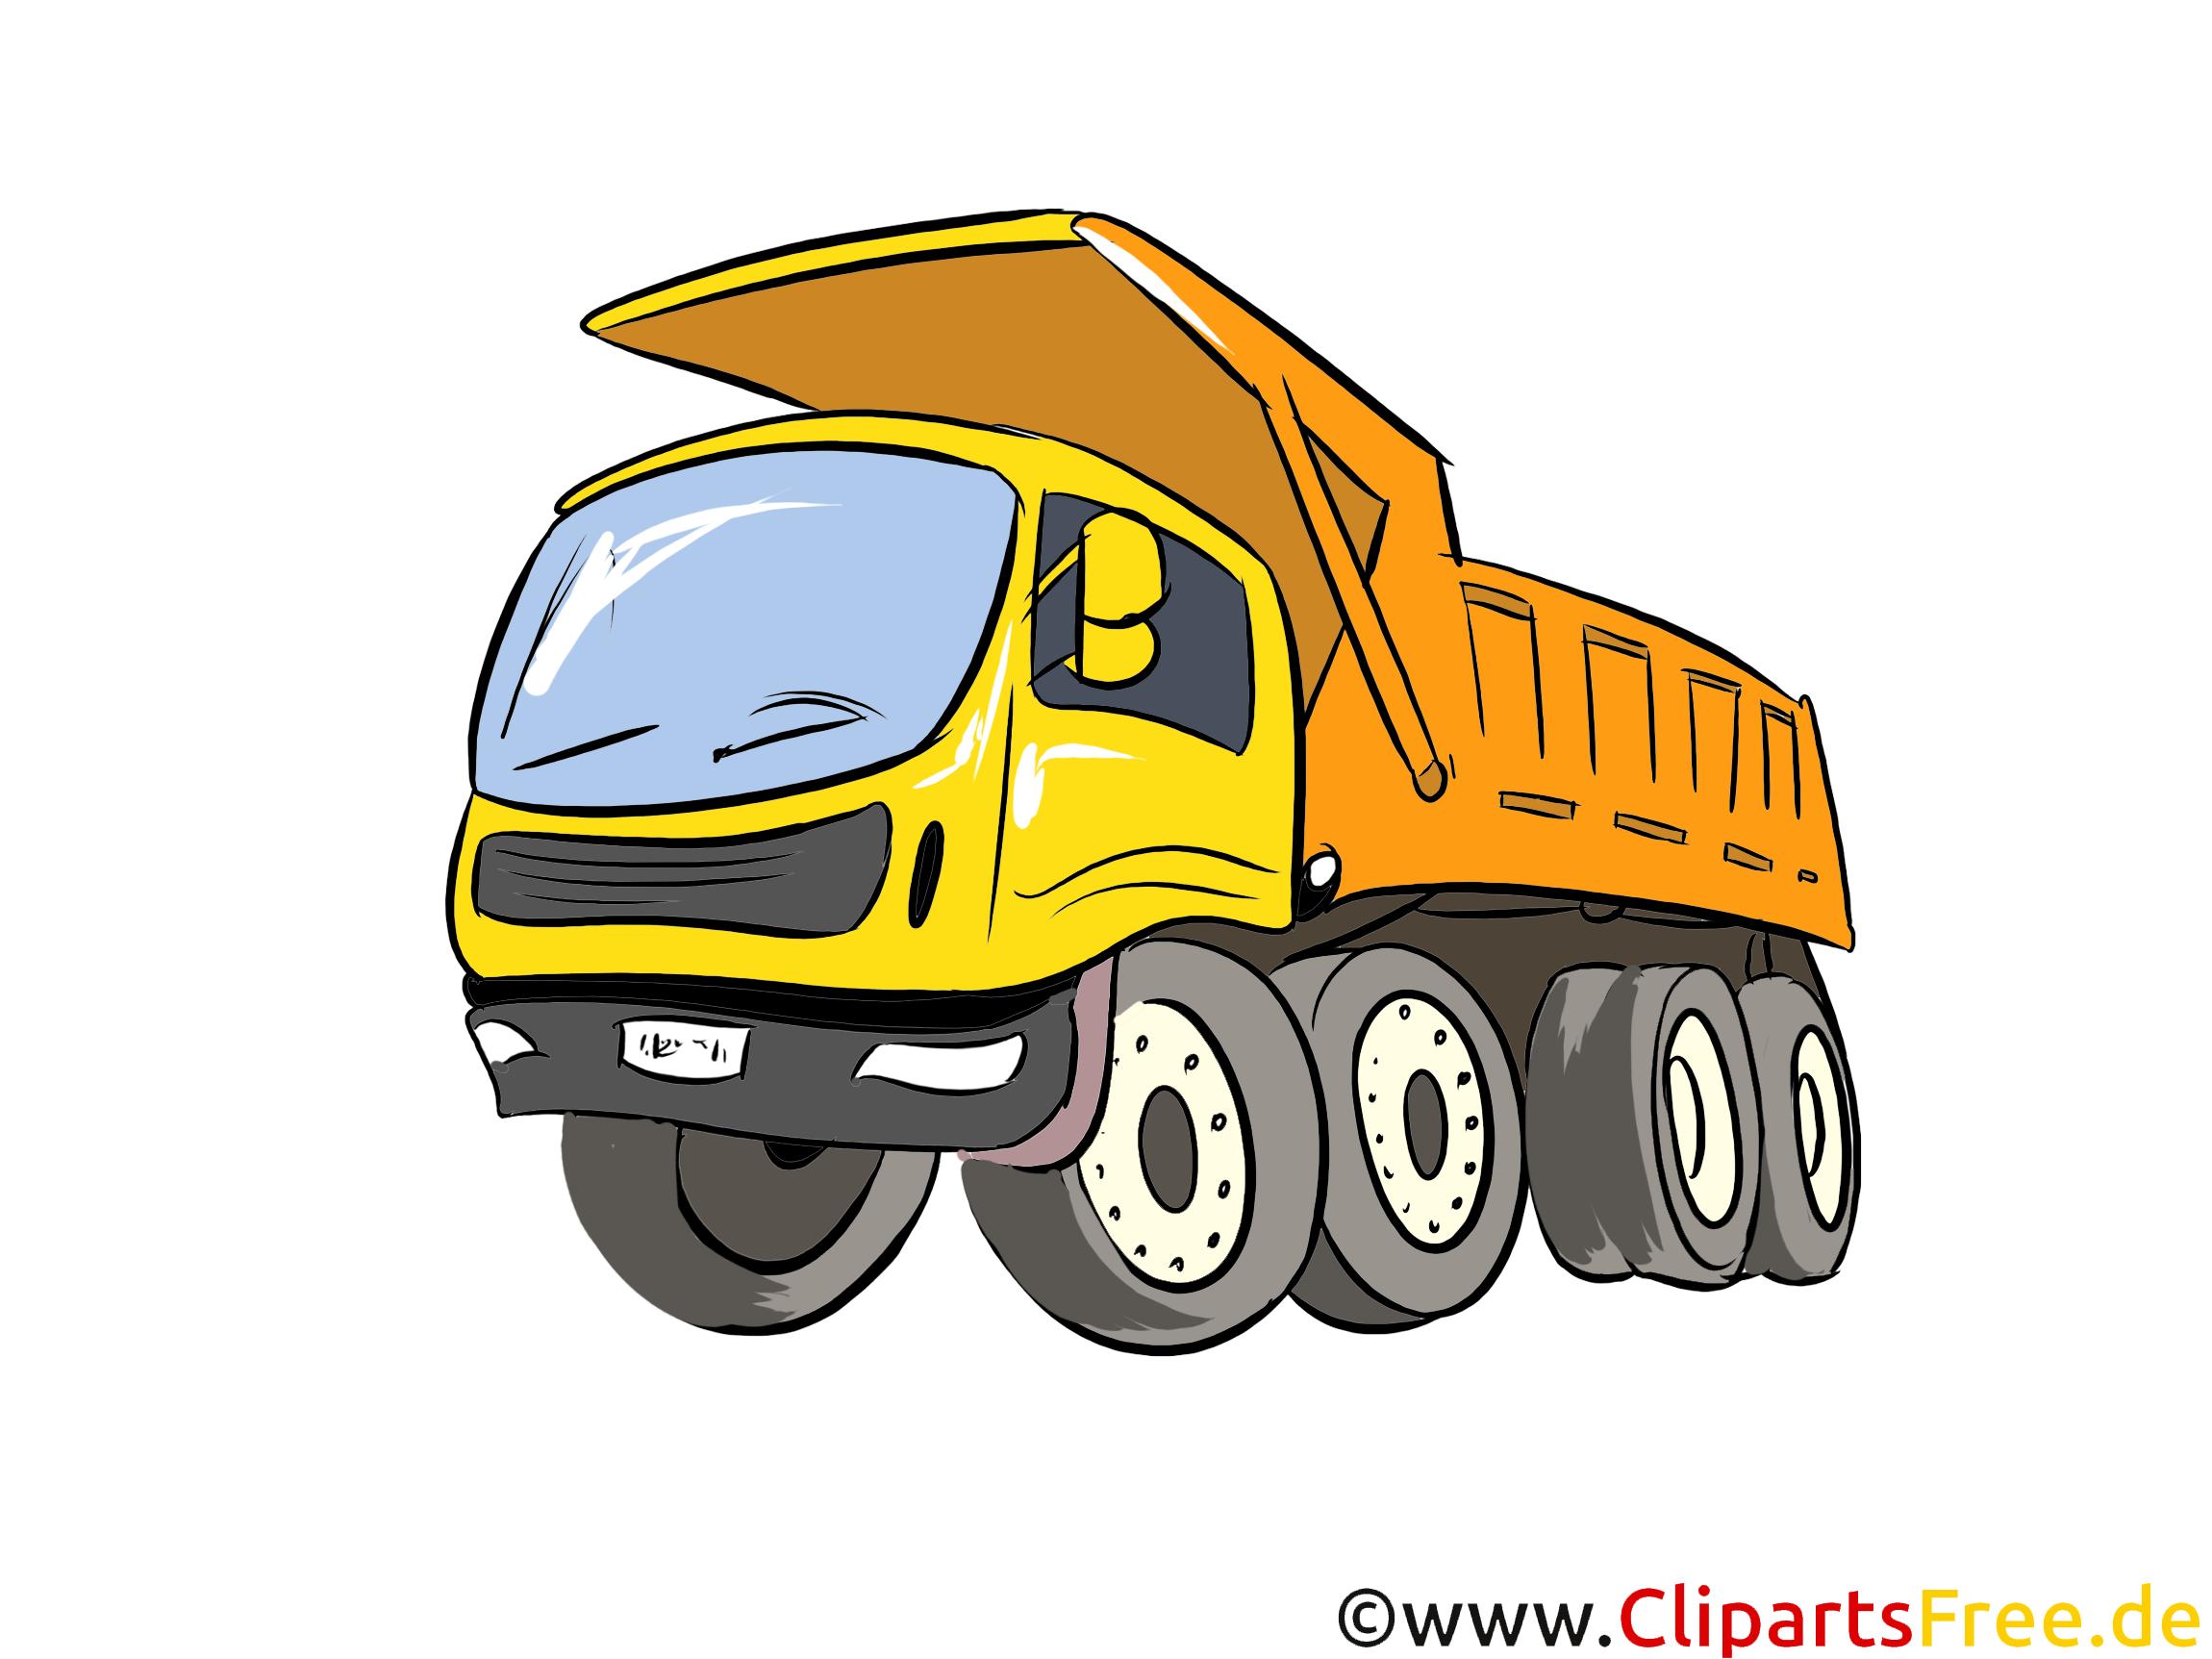 LKW Kipper Illustration, Bild, Clipart Autos